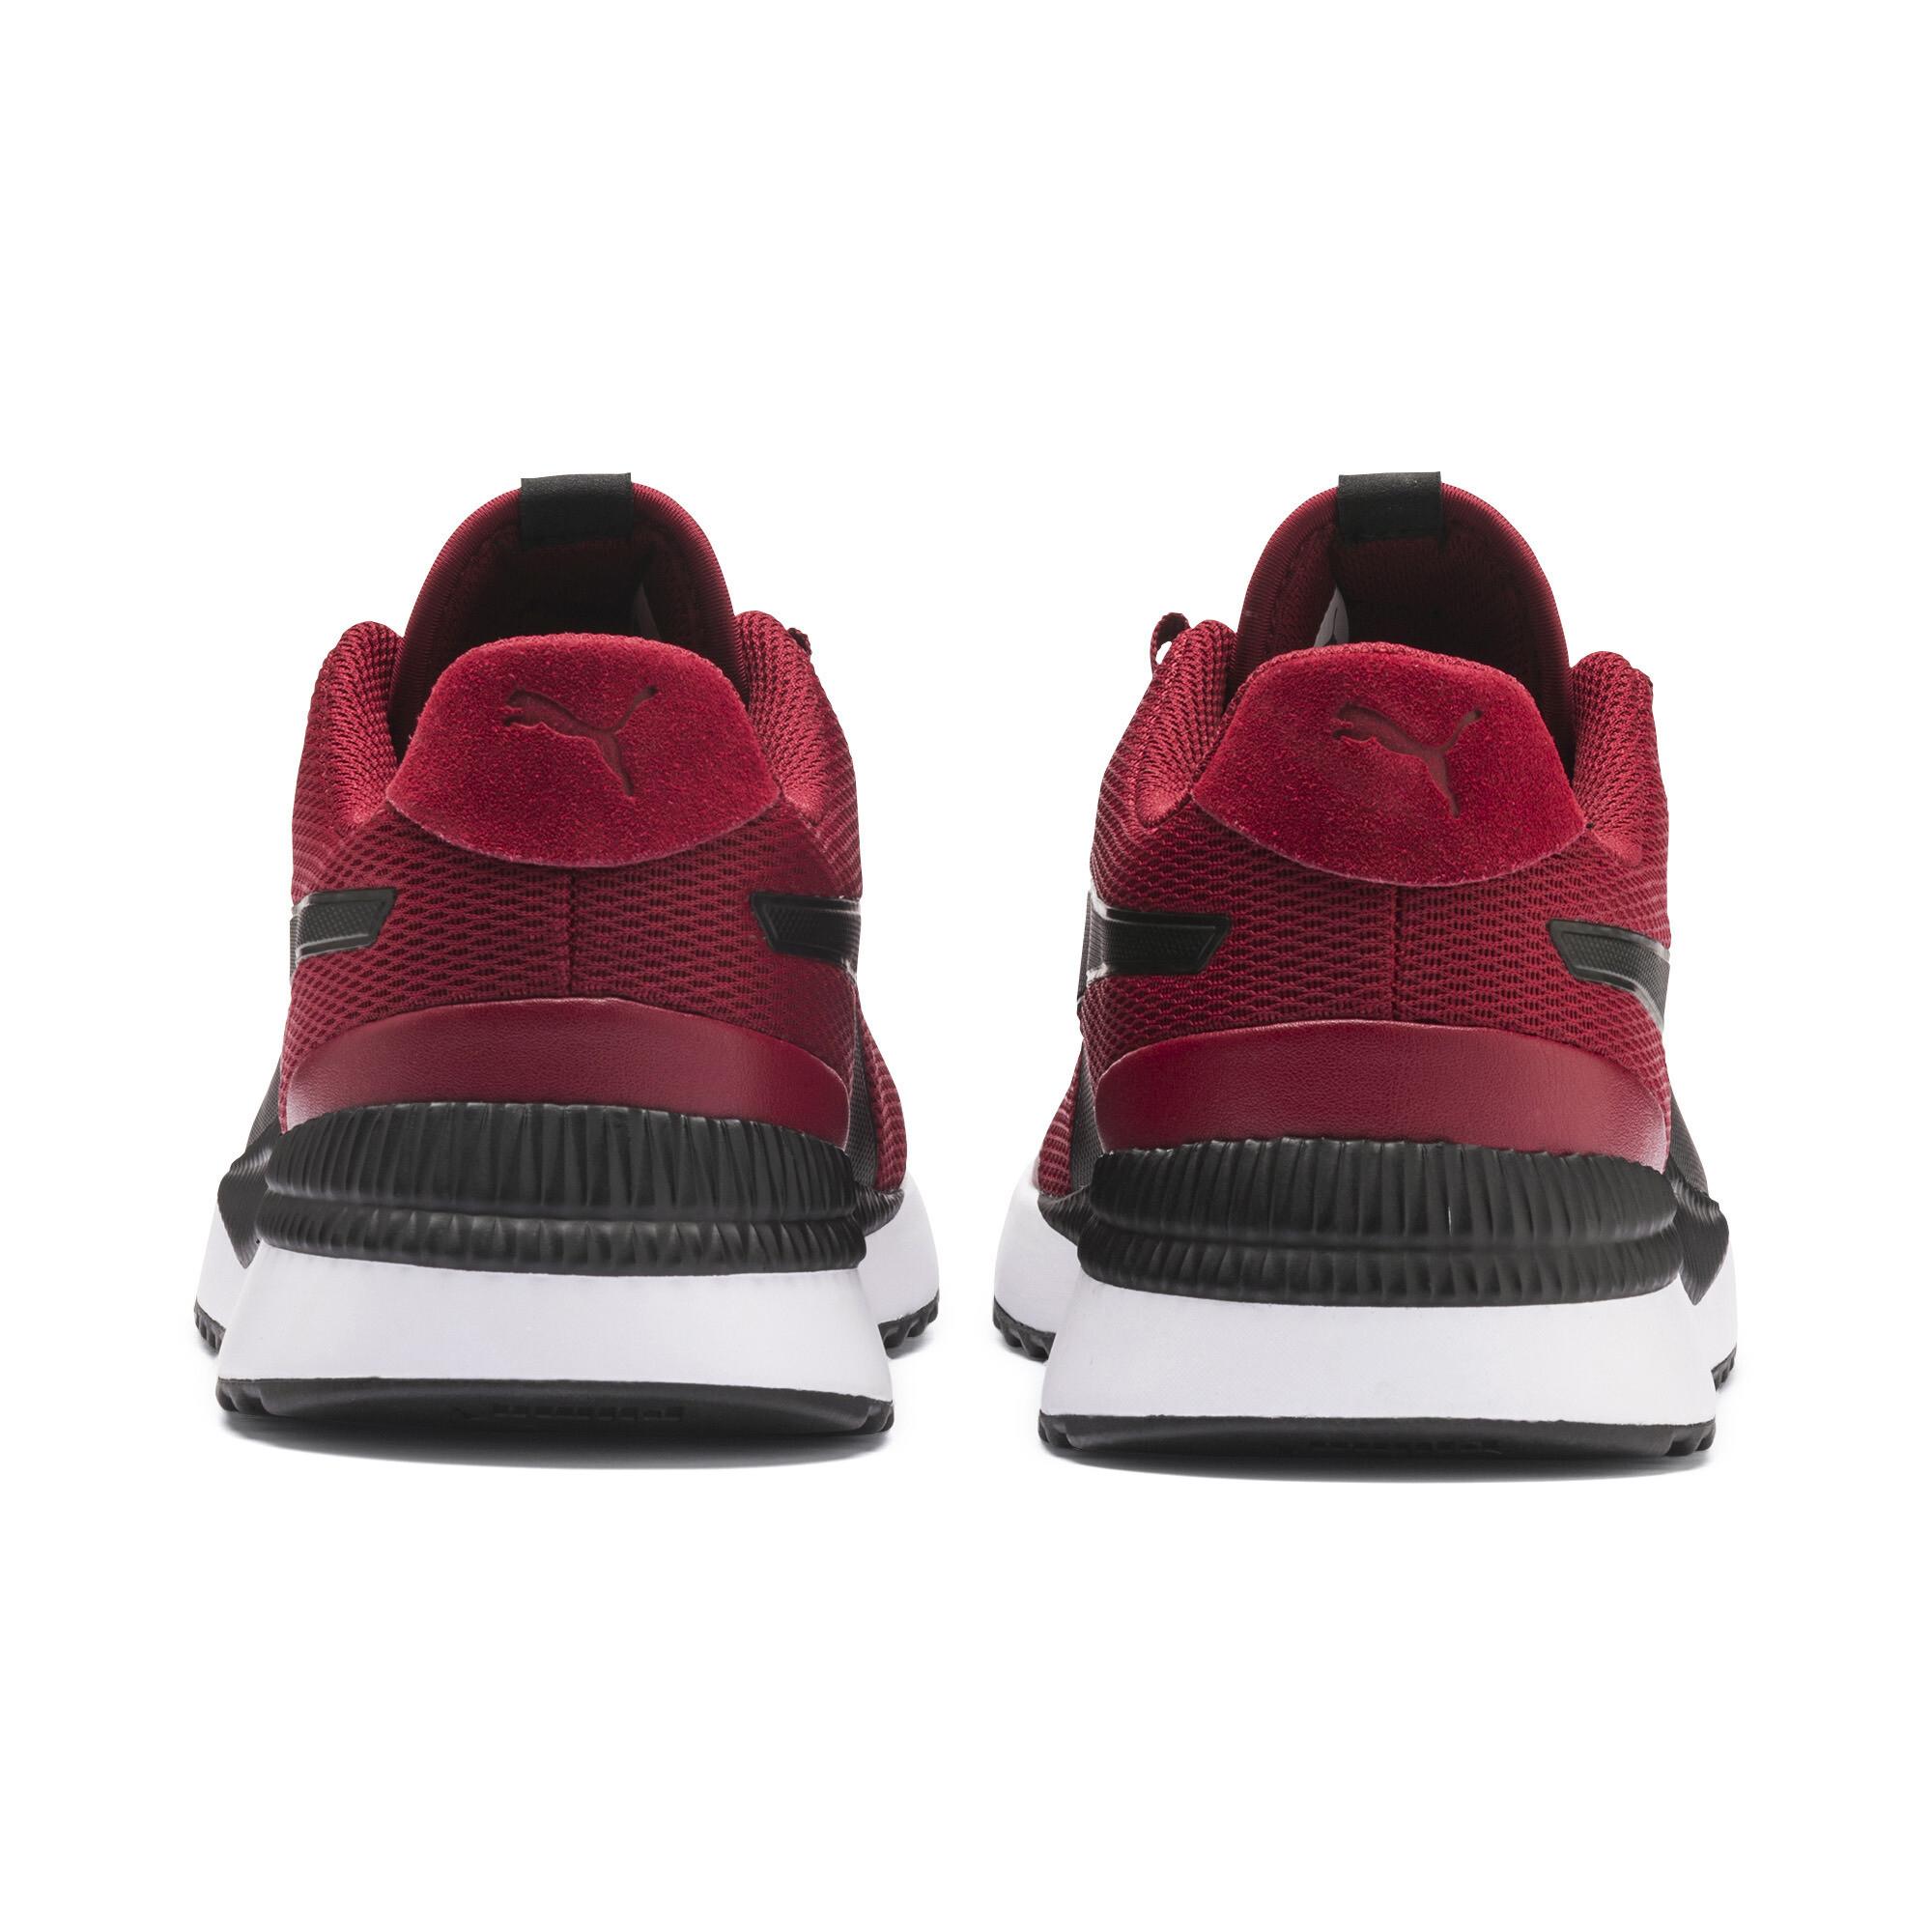 PUMA-Pacer-Next-FS-Men-039-s-Sneakers-Unisex-Shoe-Basics thumbnail 9